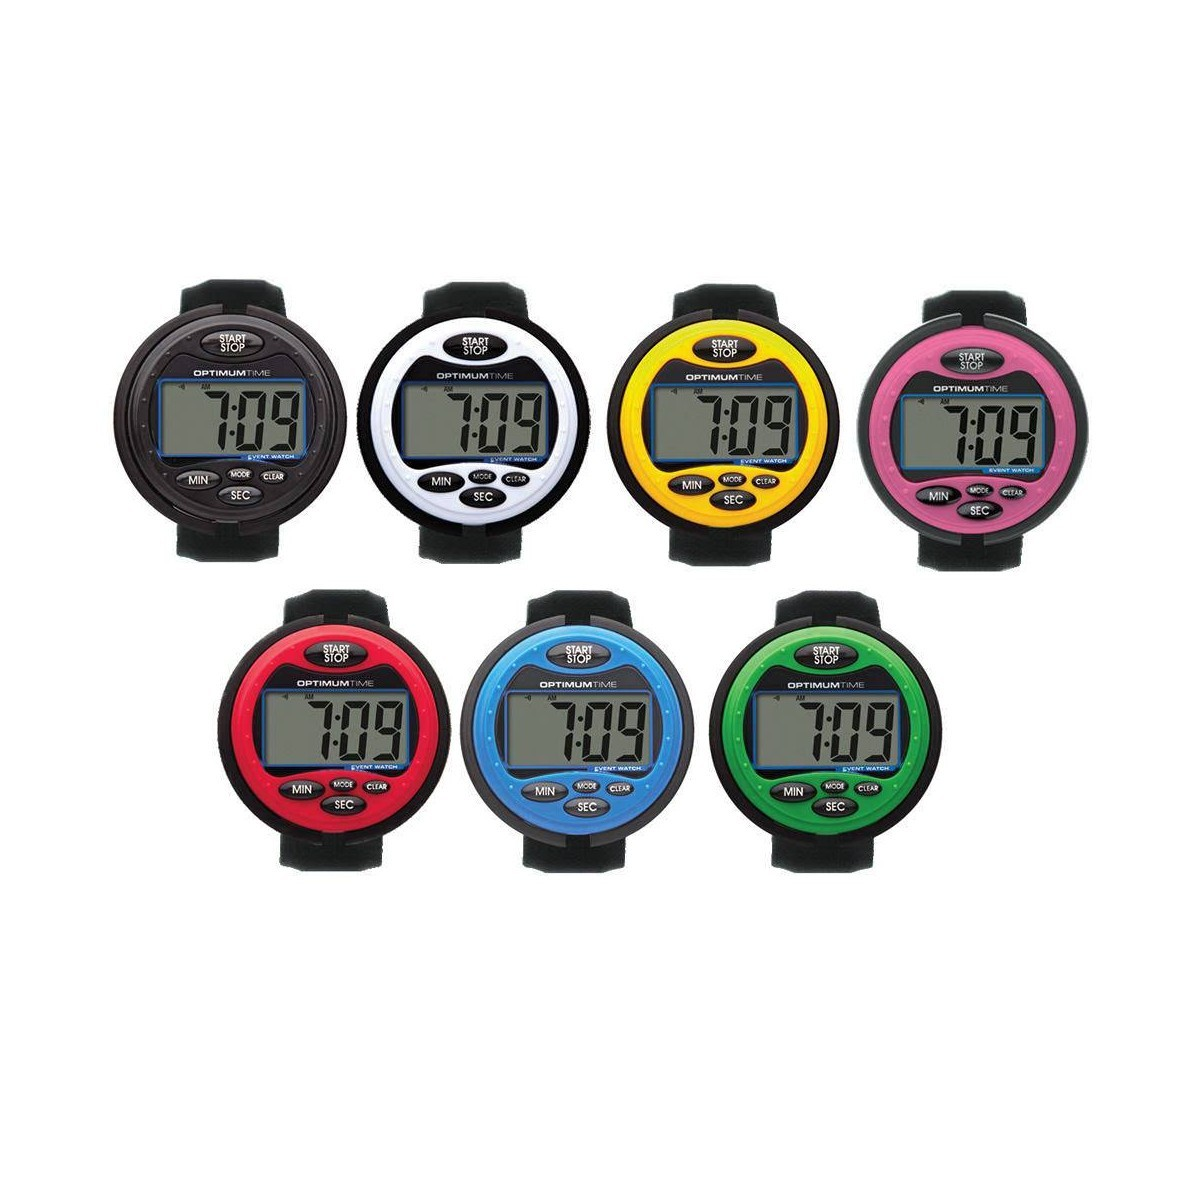 Optimum Time OE Series 3 (390 Range) Event Watch